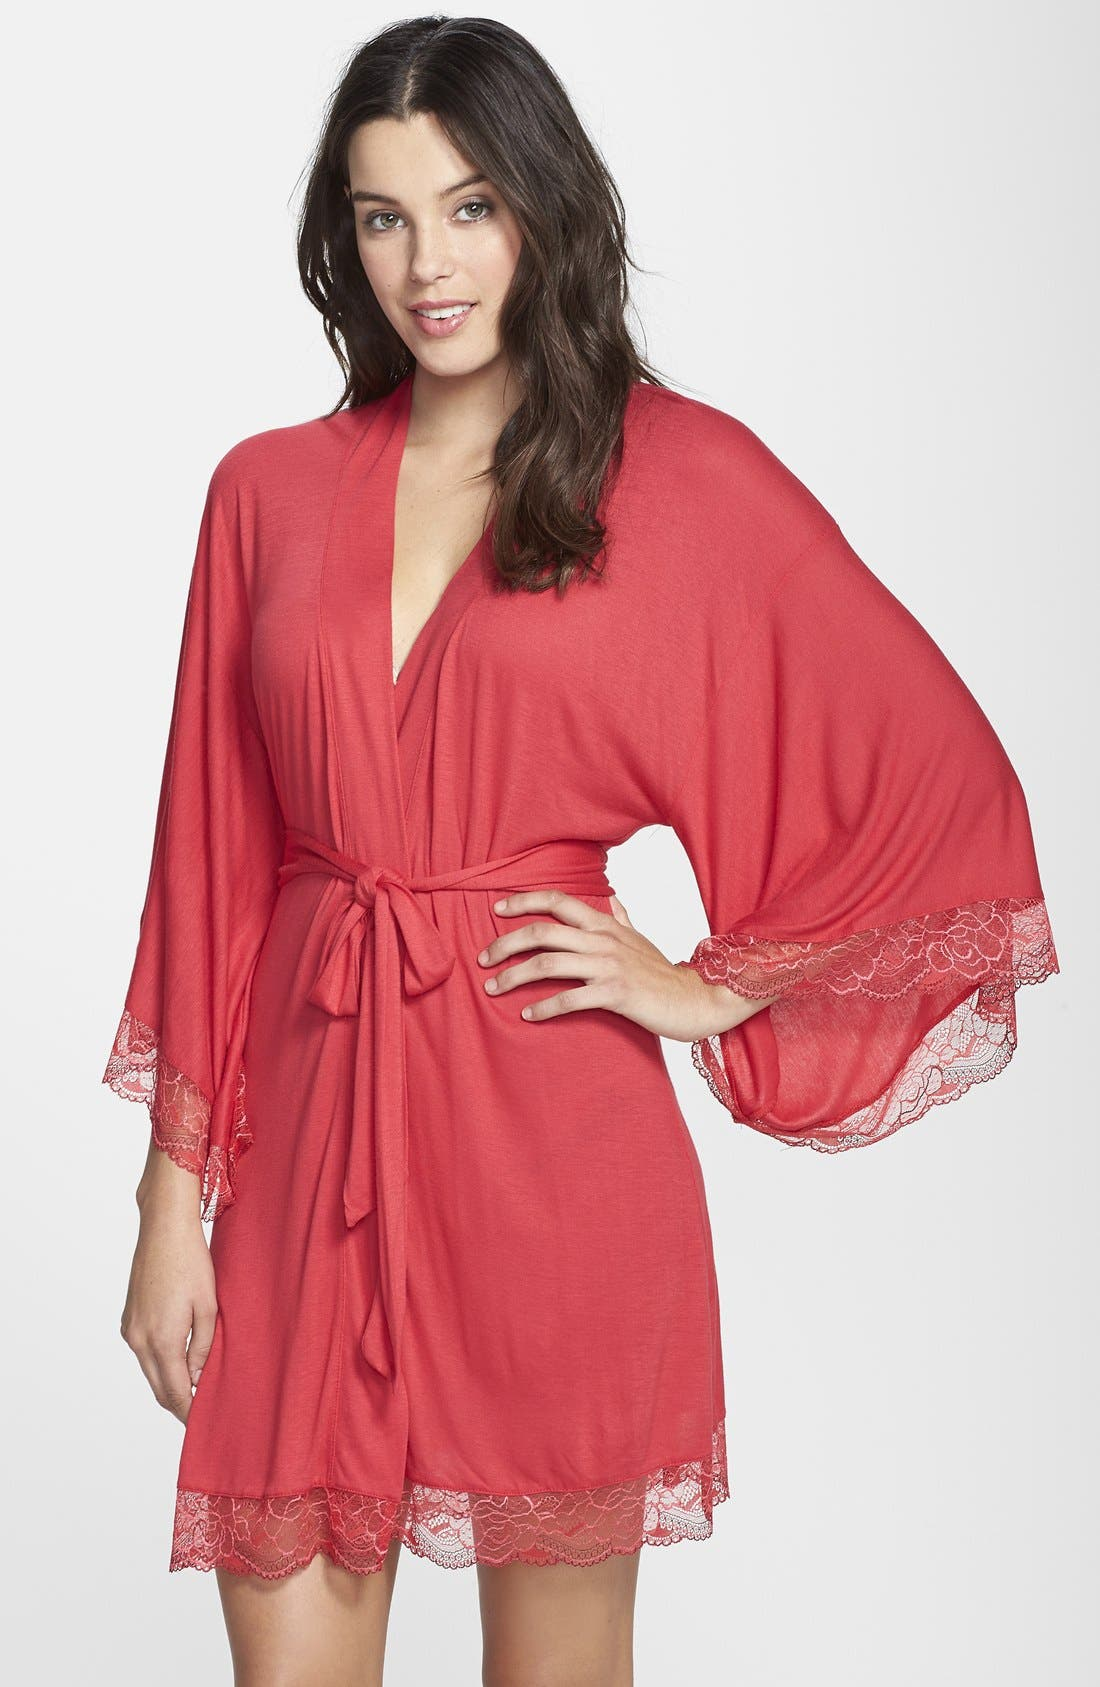 Alternate Image 1 Selected - Eberjey 'Cassandra' Lace Trim Kimono Robe